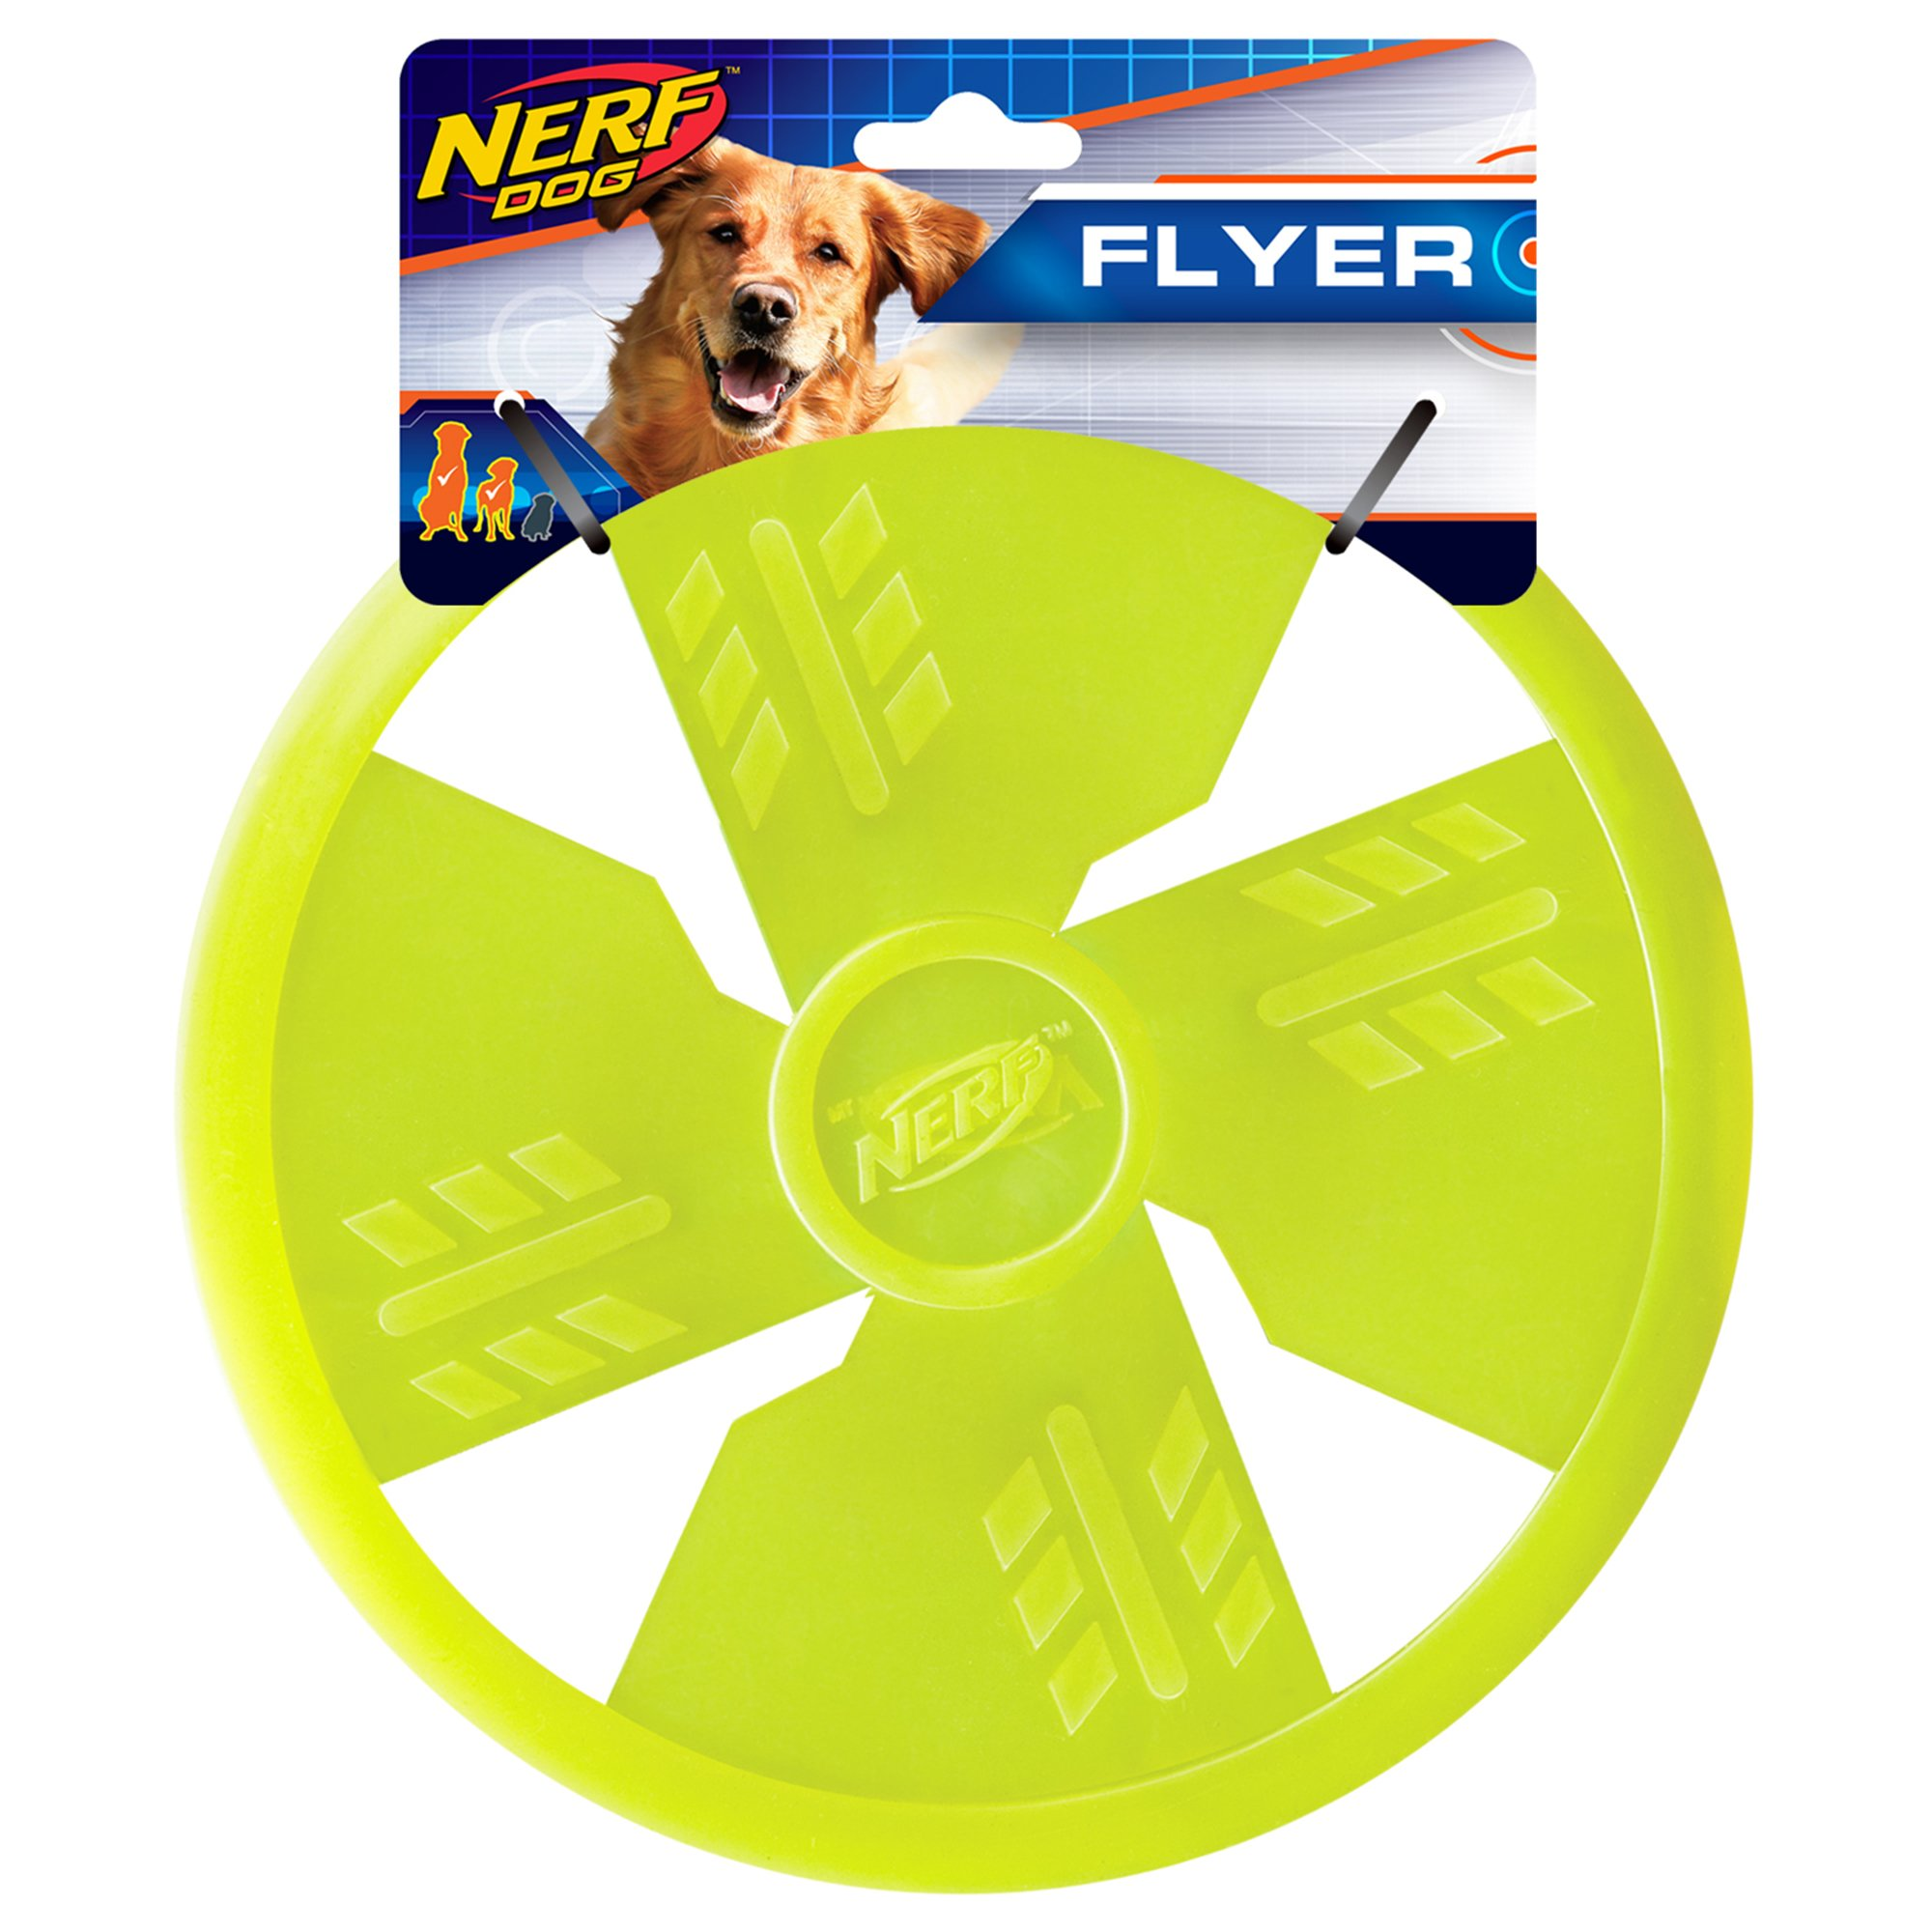 Nerf Dog TPR Float Flyer Flying Disc Dog Toy, Large, Green